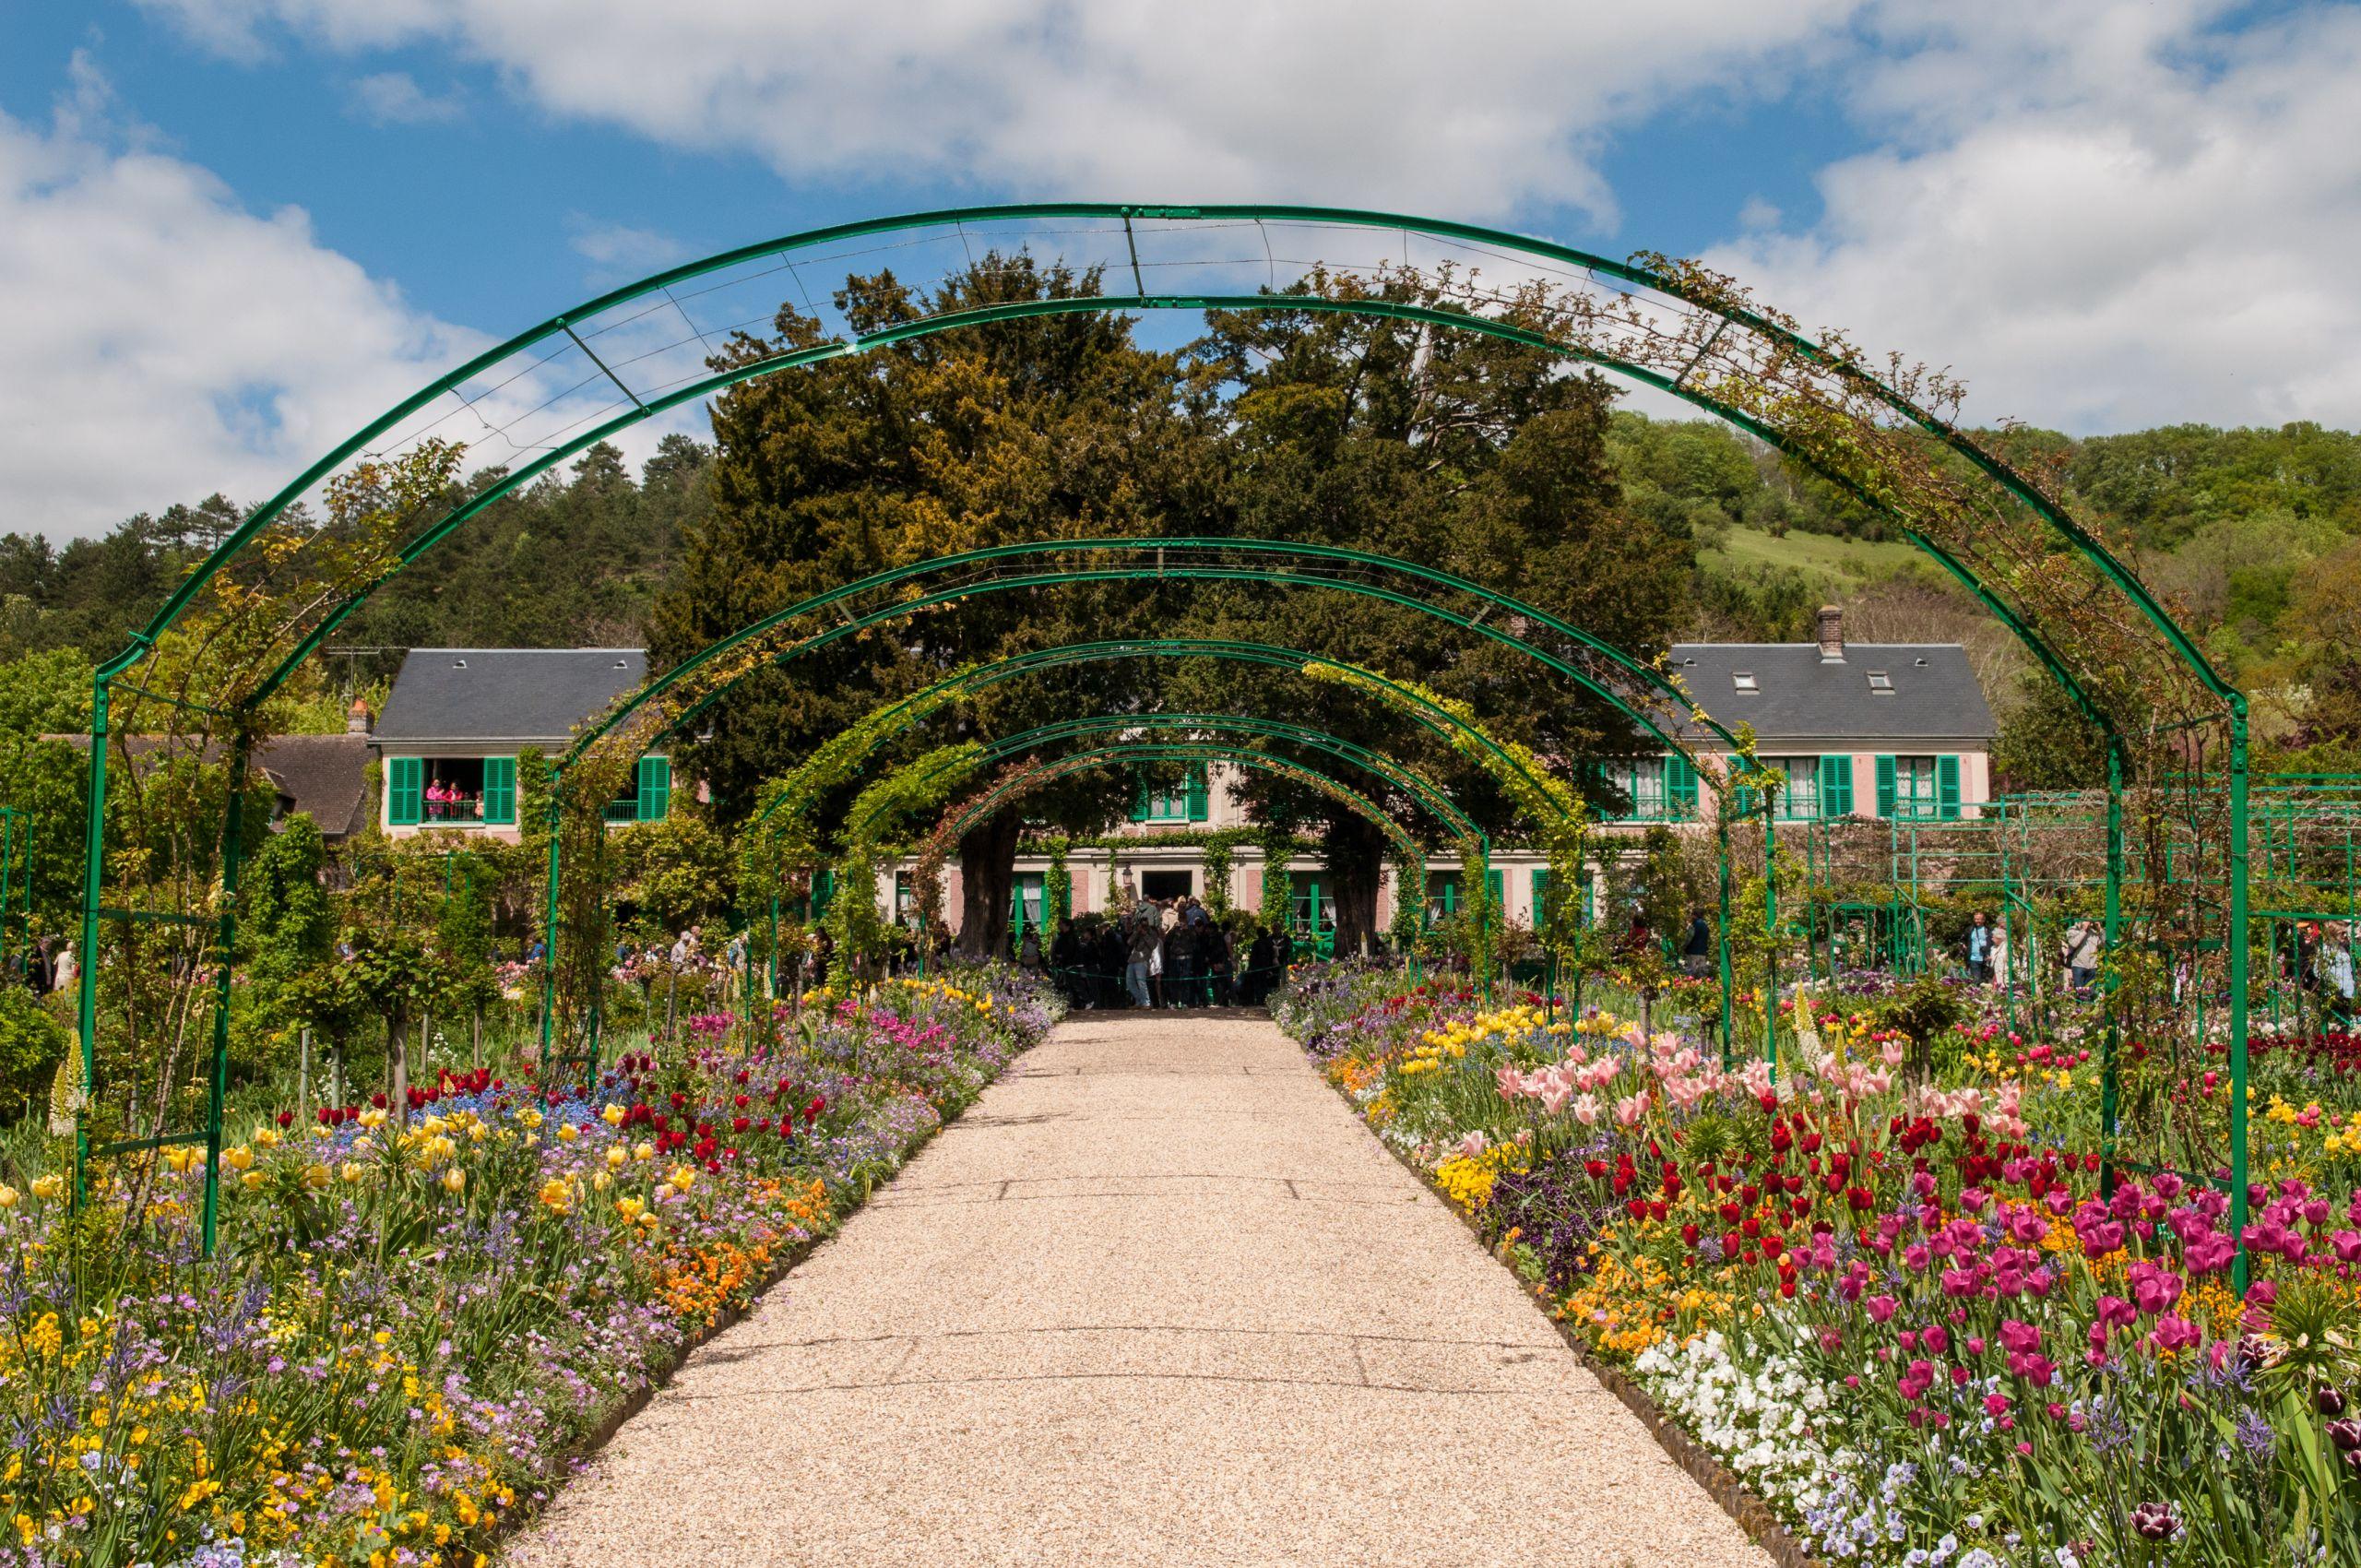 Garten Versailles Best Of Fondation Monet In Giverny Wikiwand